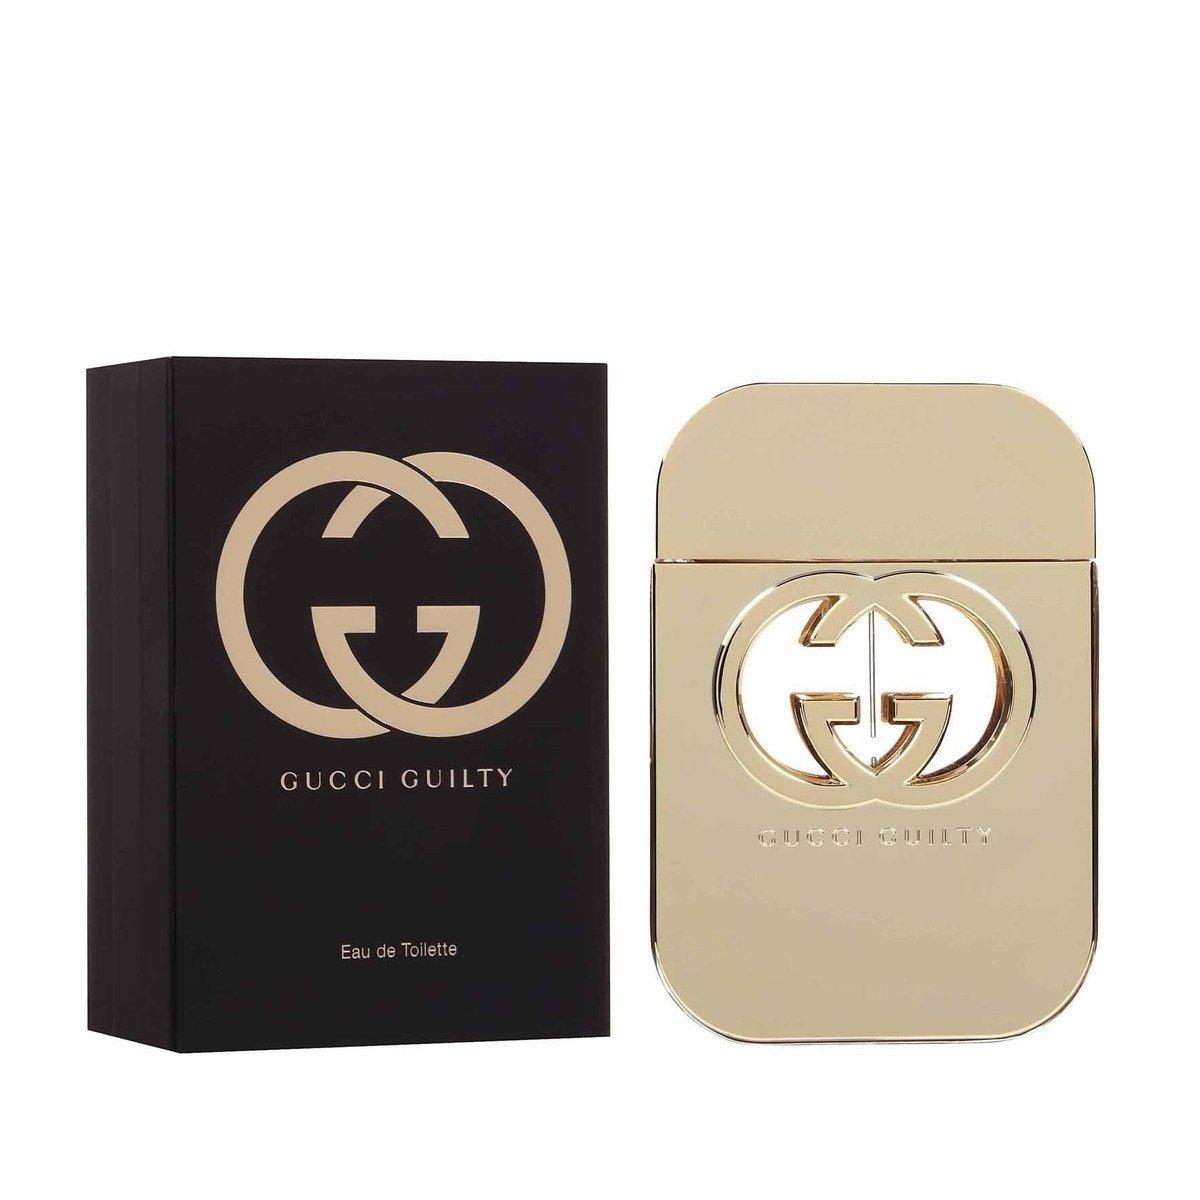 Guilty by Gucci  for Women, Eau de Toilette Spray, 2.5 Ounce by Gucci